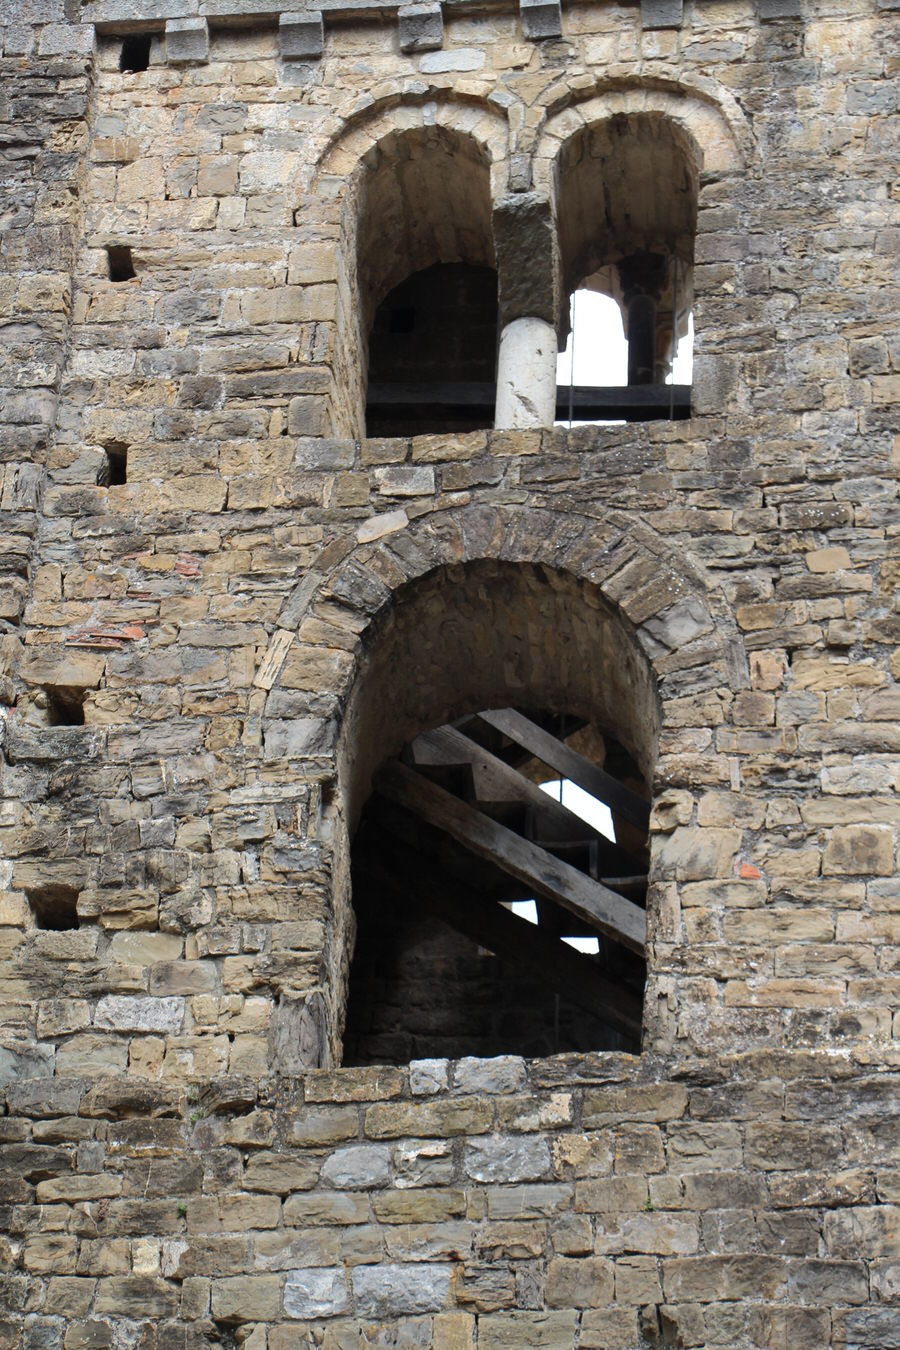 img_4502.jpg -Detalle del campanario. Iglesia San Cristobal, Beget-